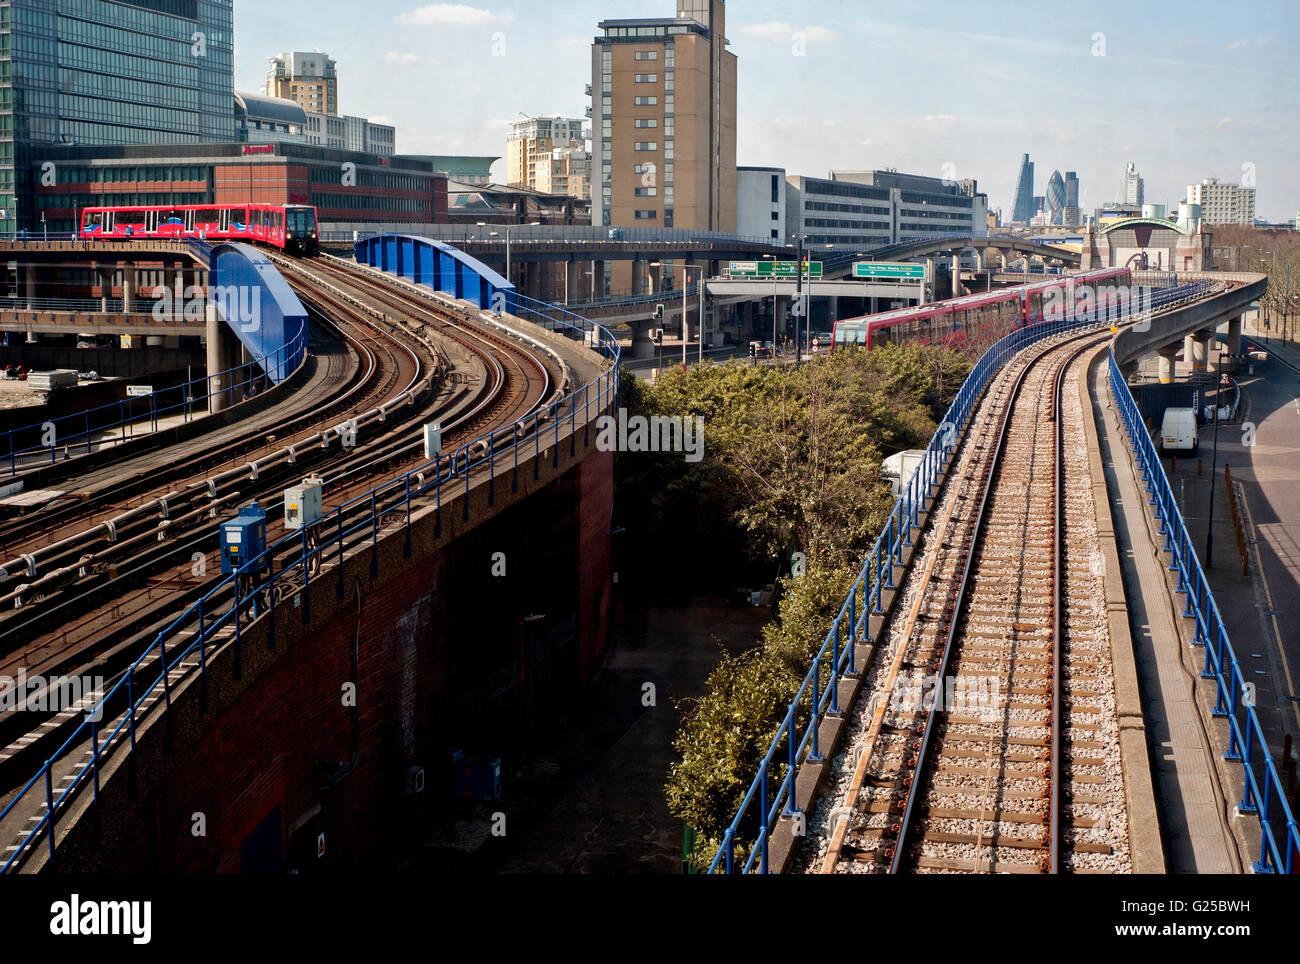 London light railway tracks and train - Stock Image